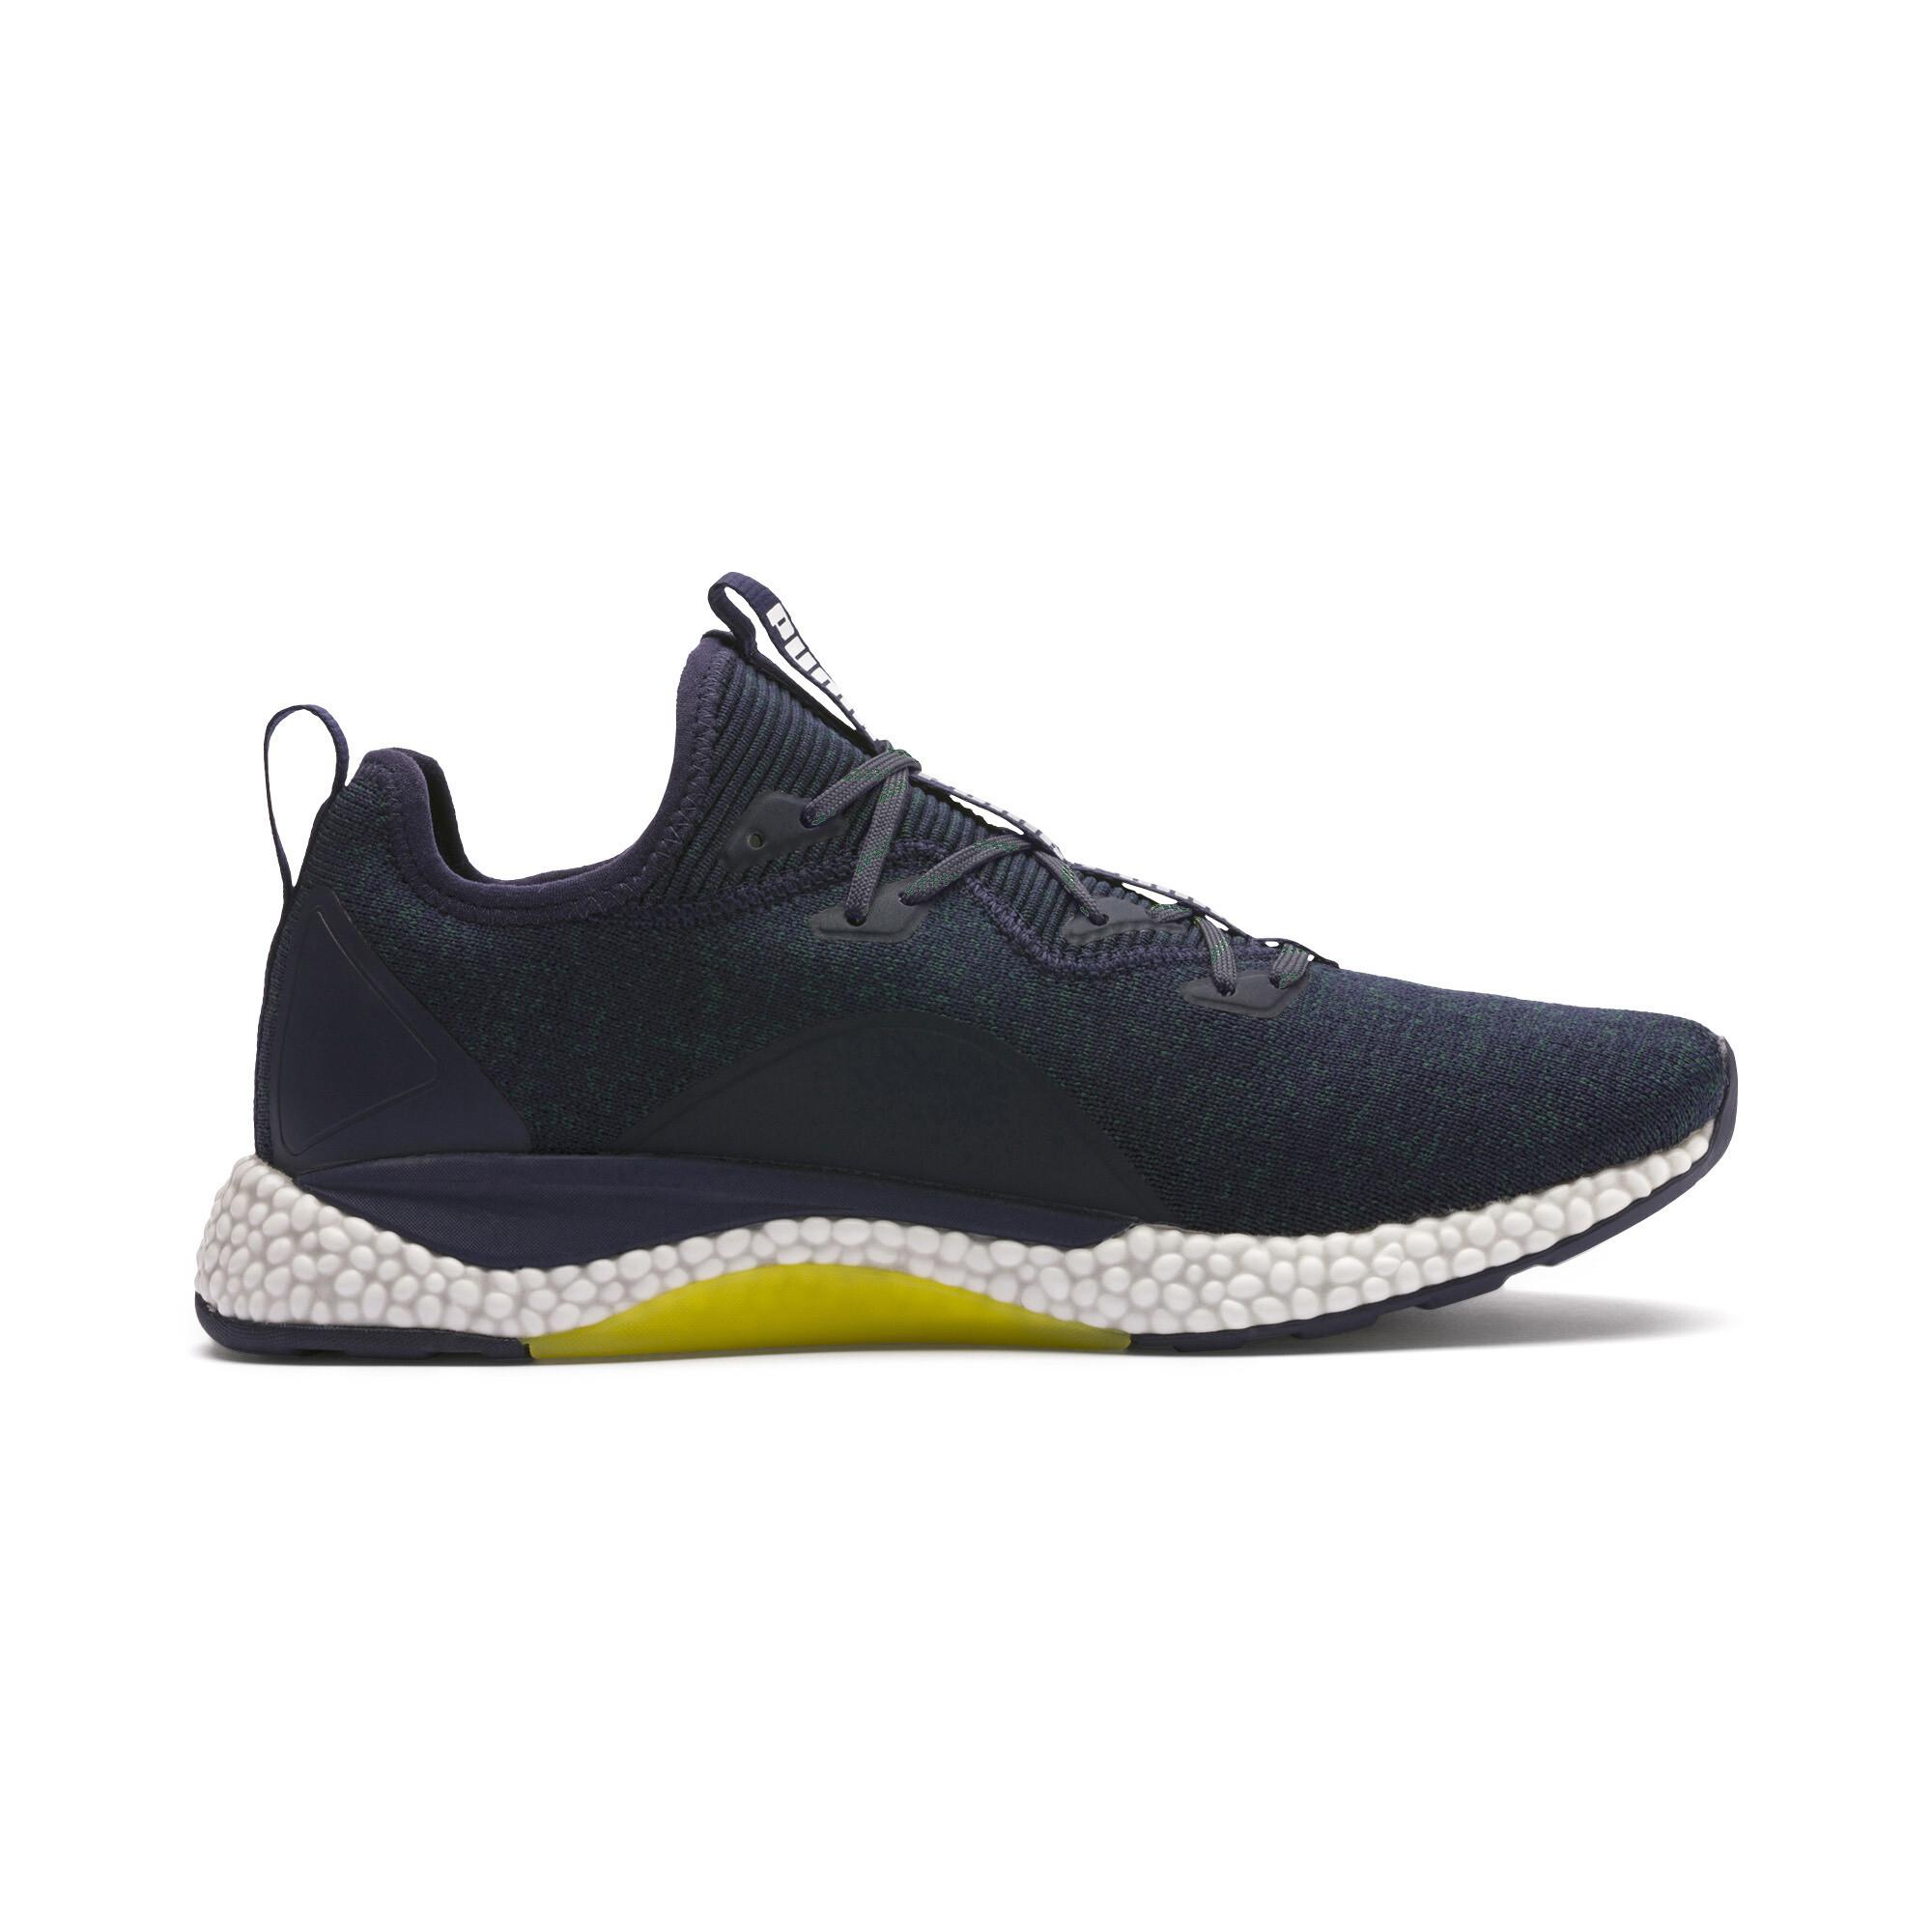 Image Puma Hybrid Runner Men's Running Shoes #6